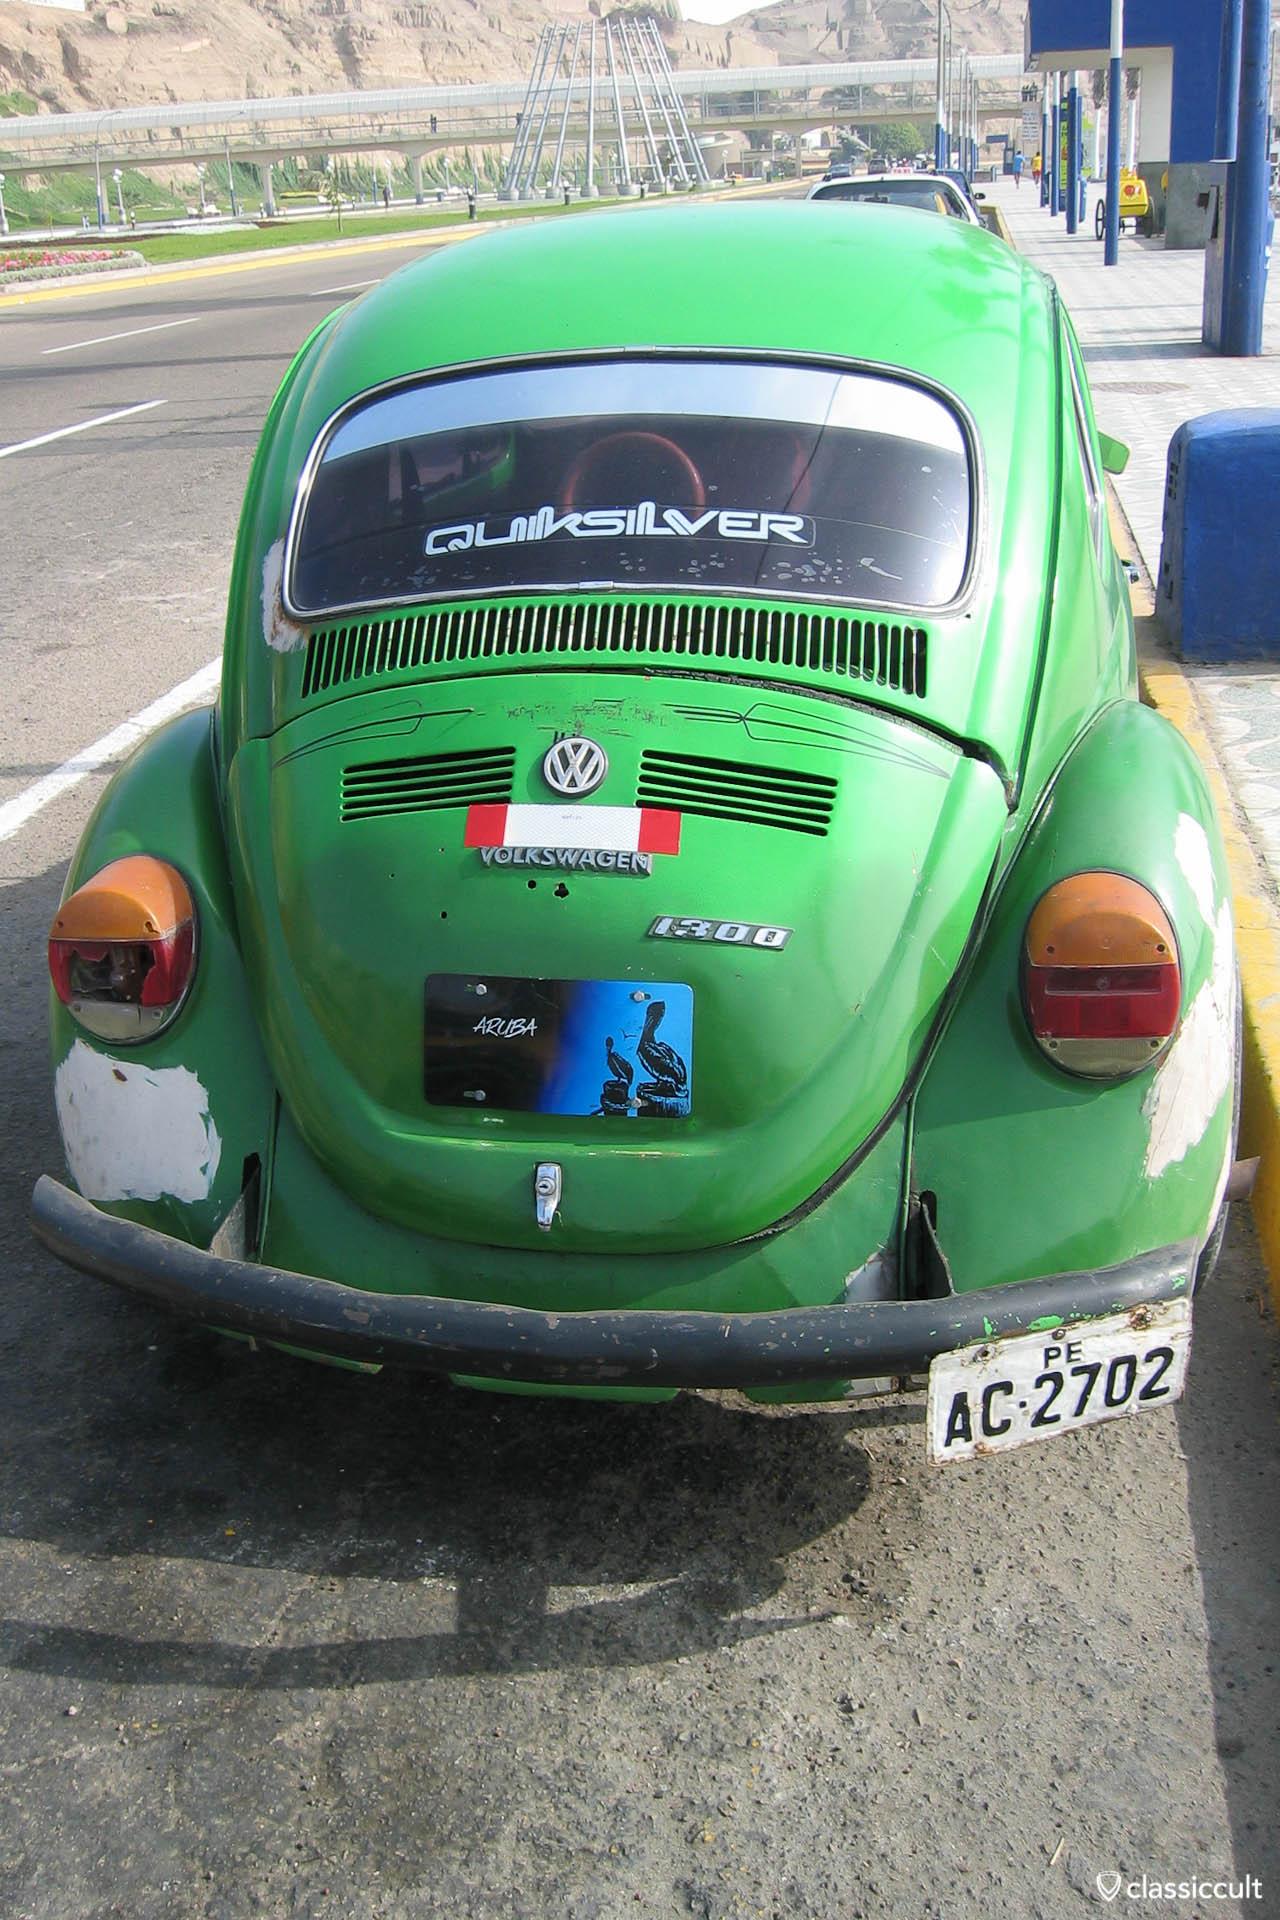 VW Bug 1300 Quicksilver Beetle Costa Verde Lima Peru